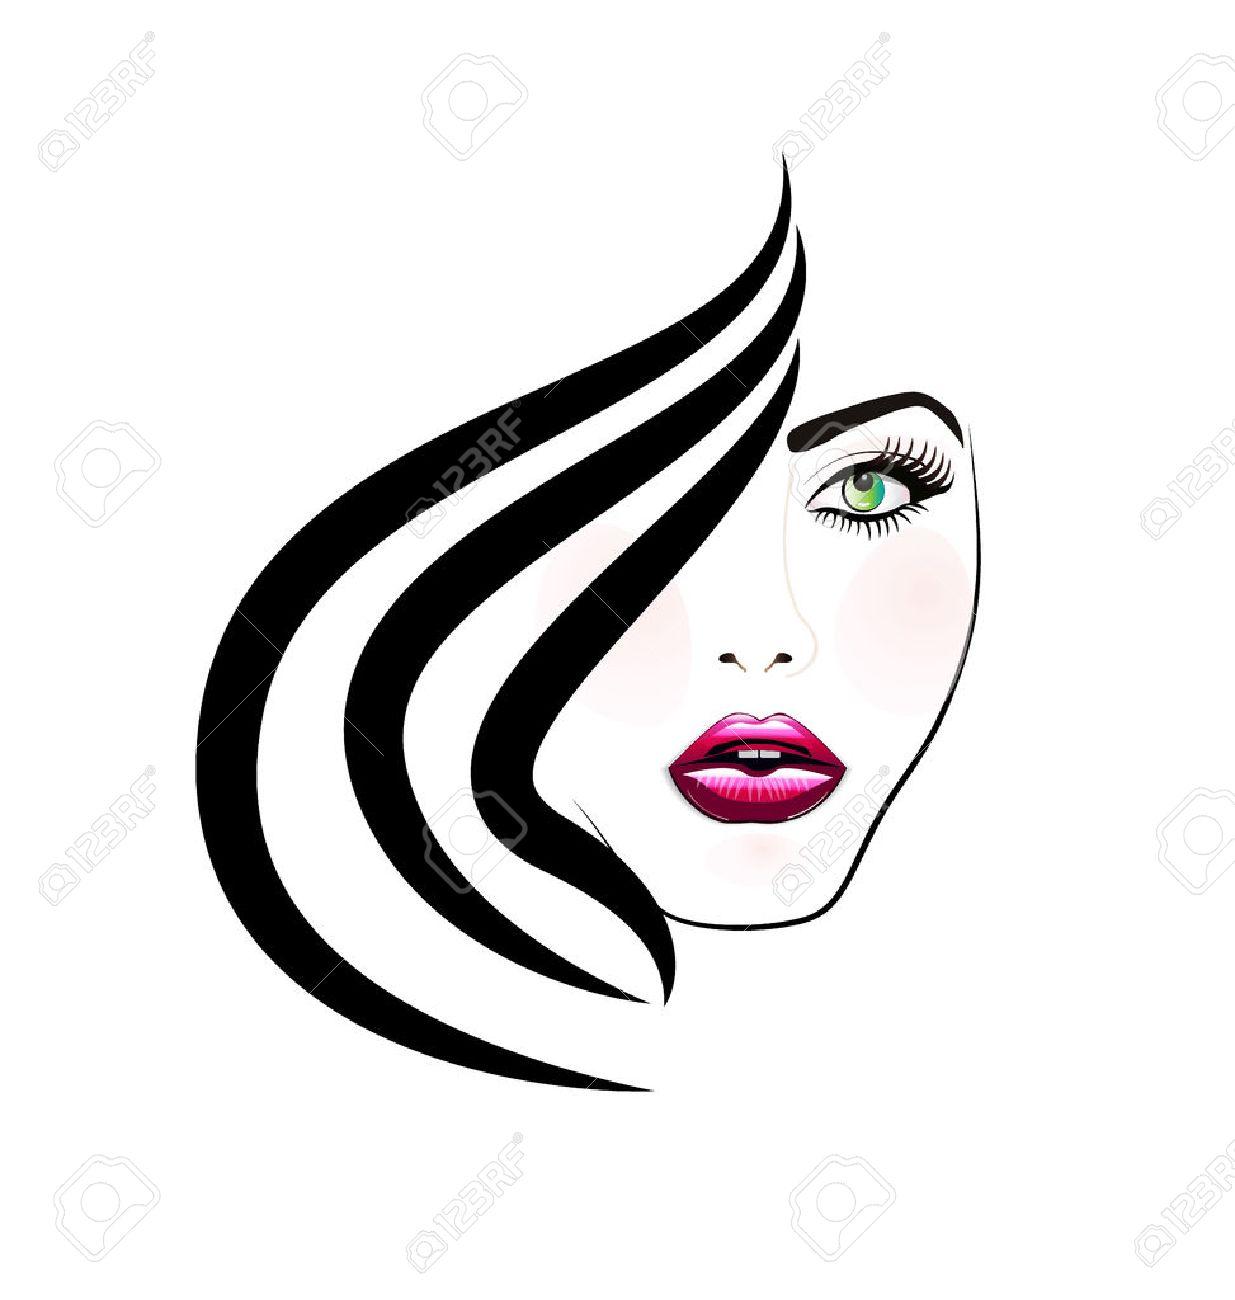 Face of pretty woman silhouette icon image - 55073097